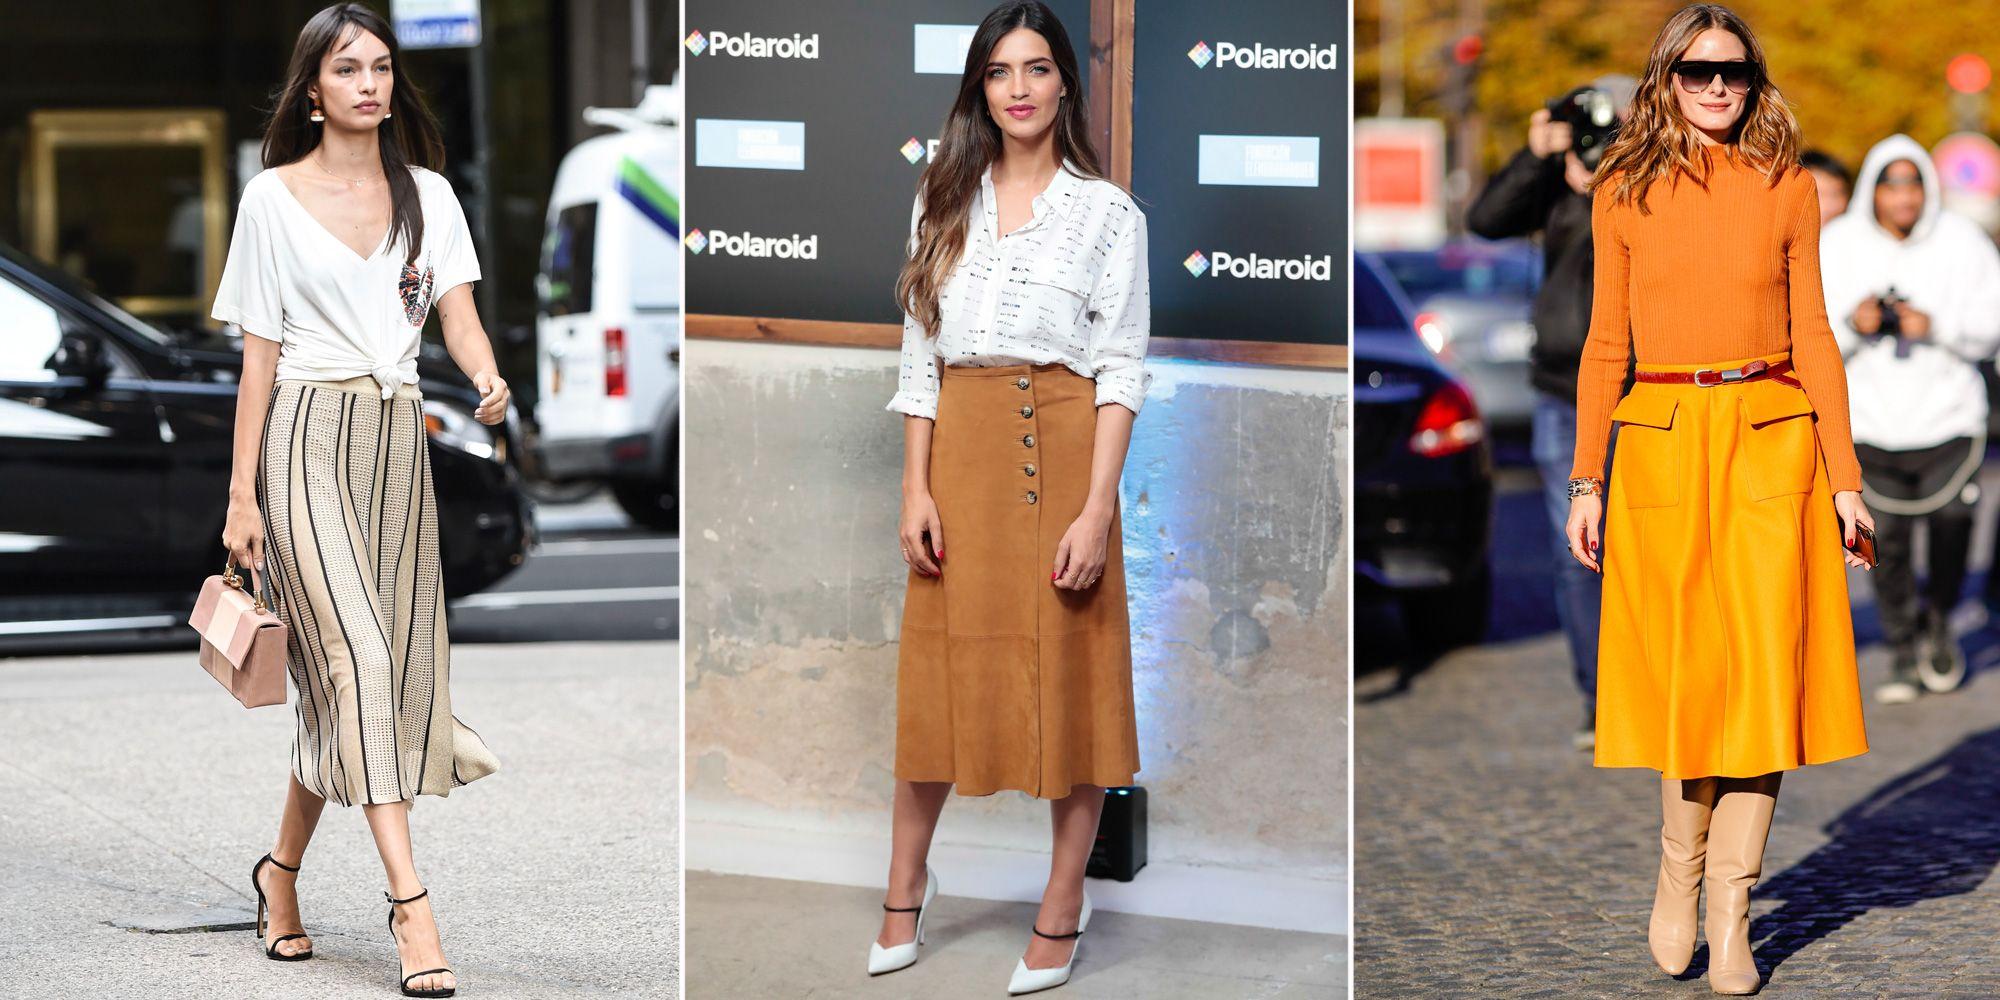 75ba04c37 La falda midi inspira los mejores looks 'working' de las famosas ...